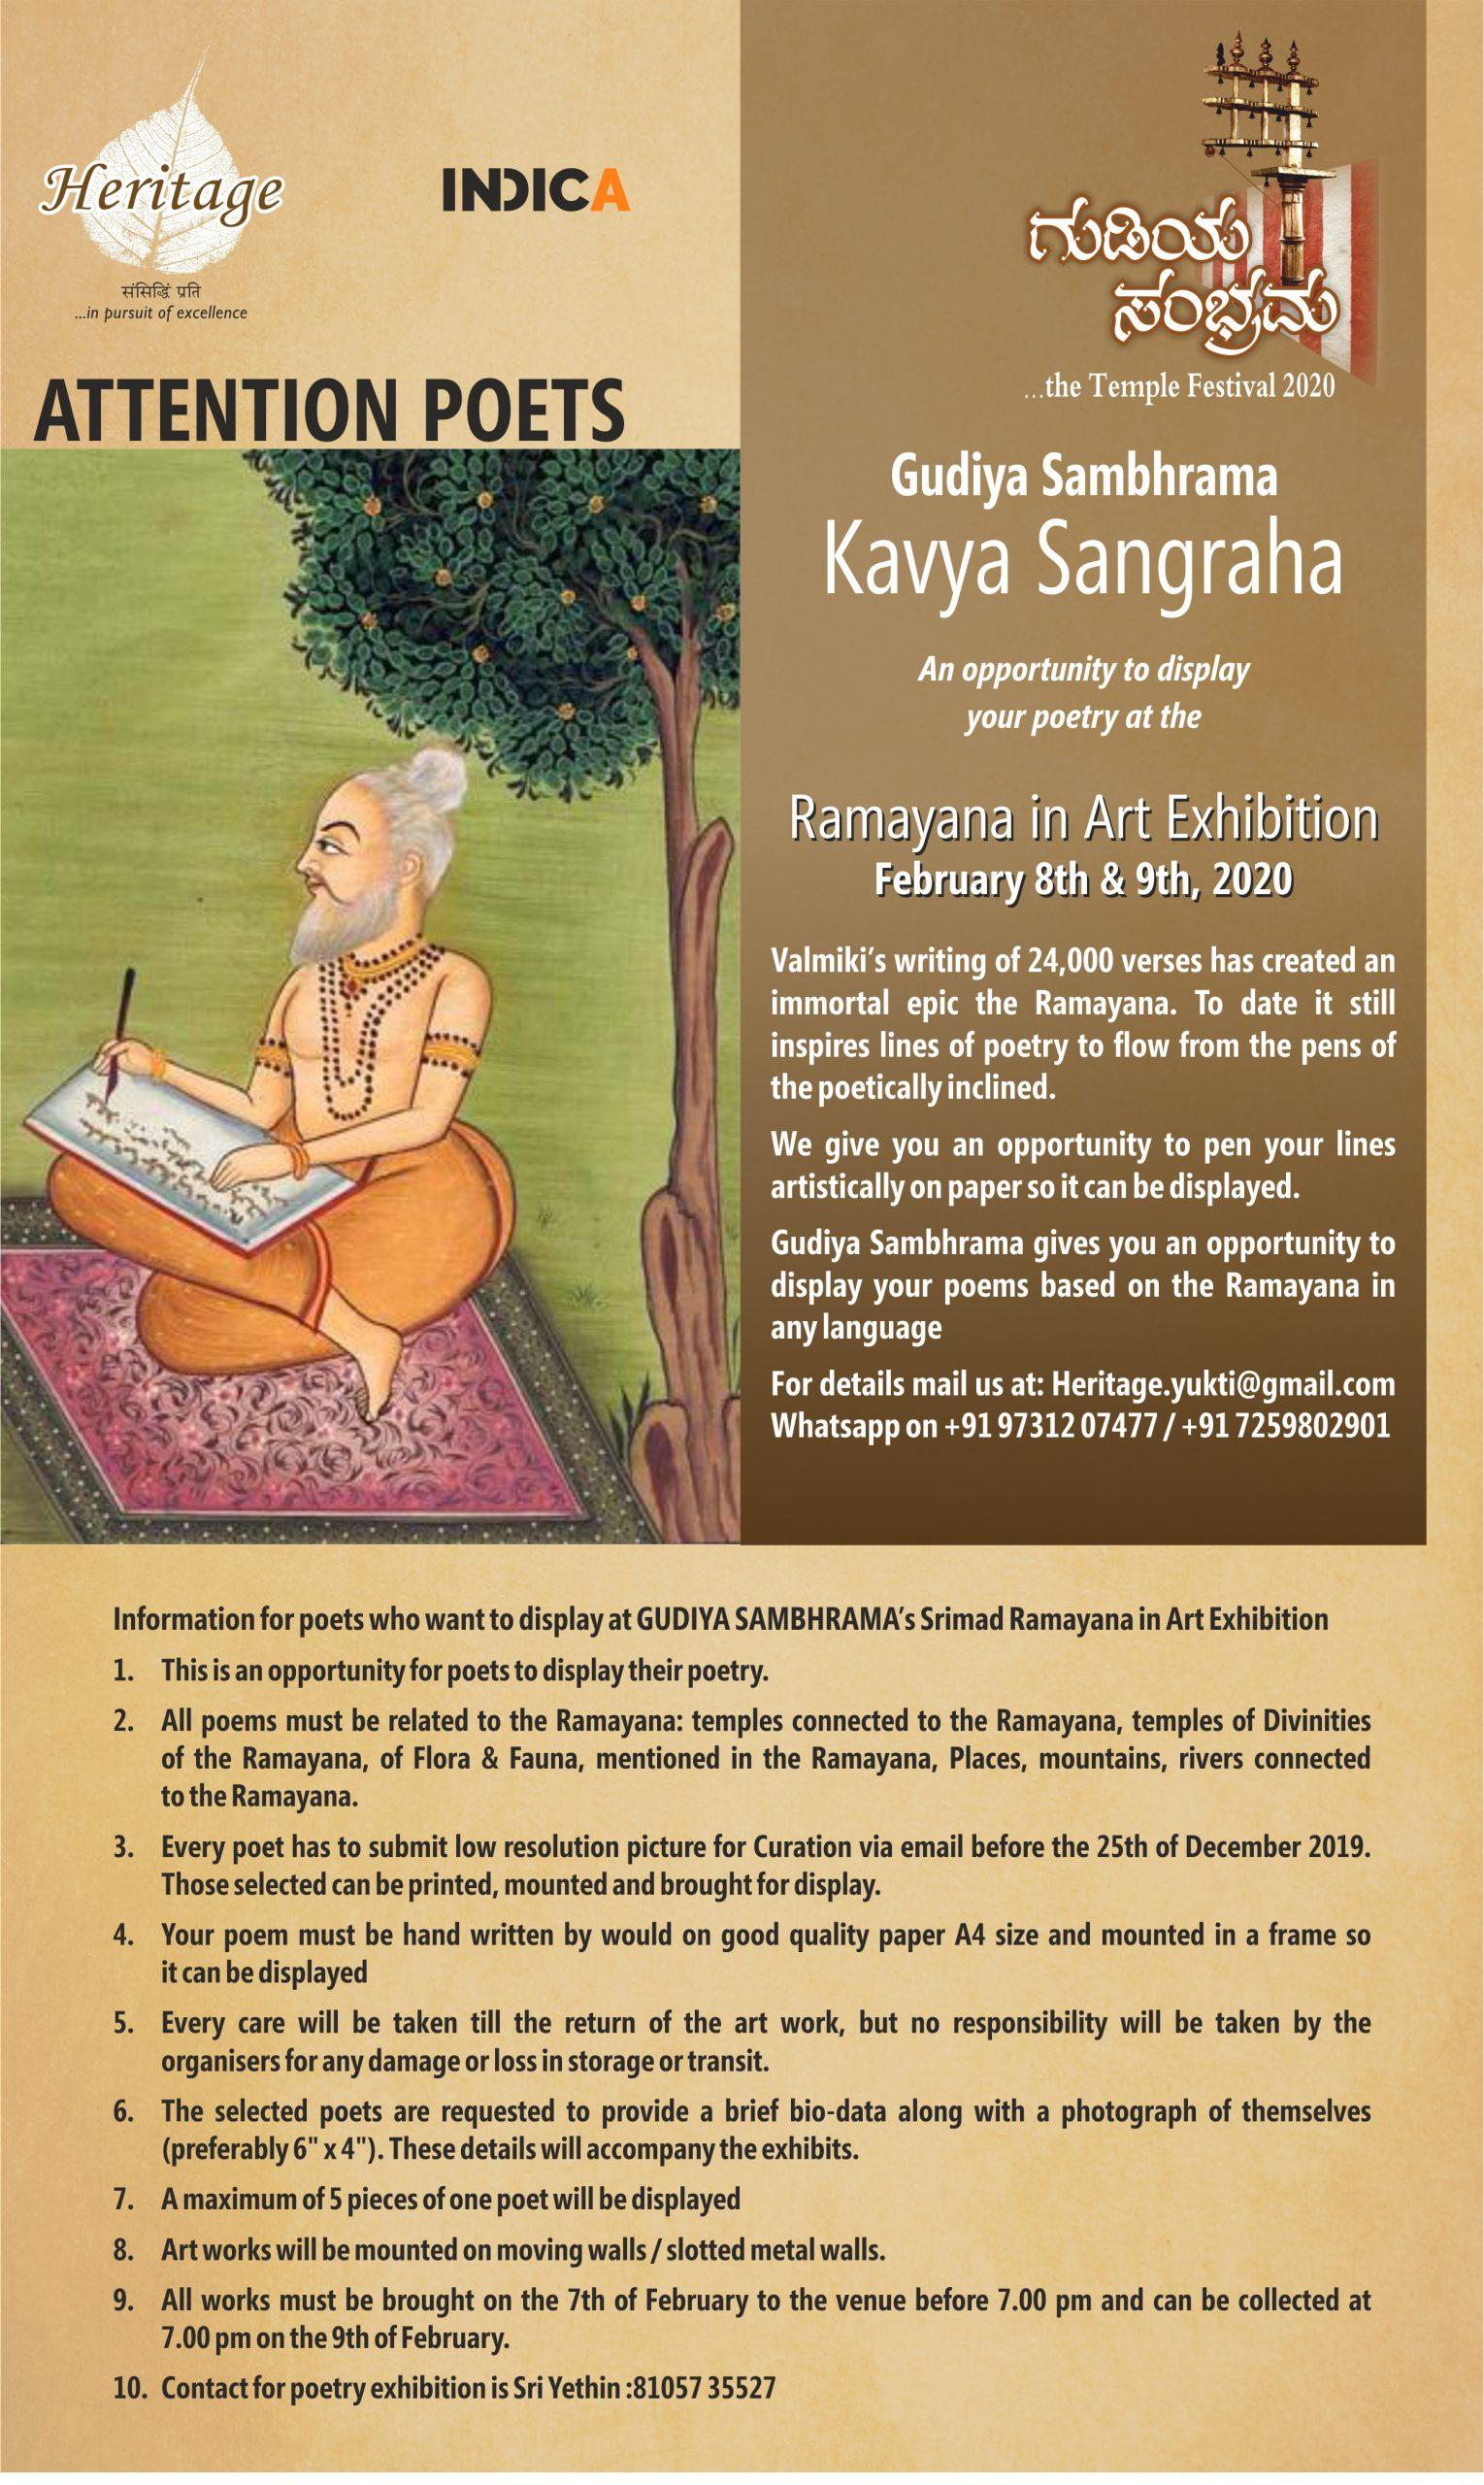 Gudiya Sambhrama